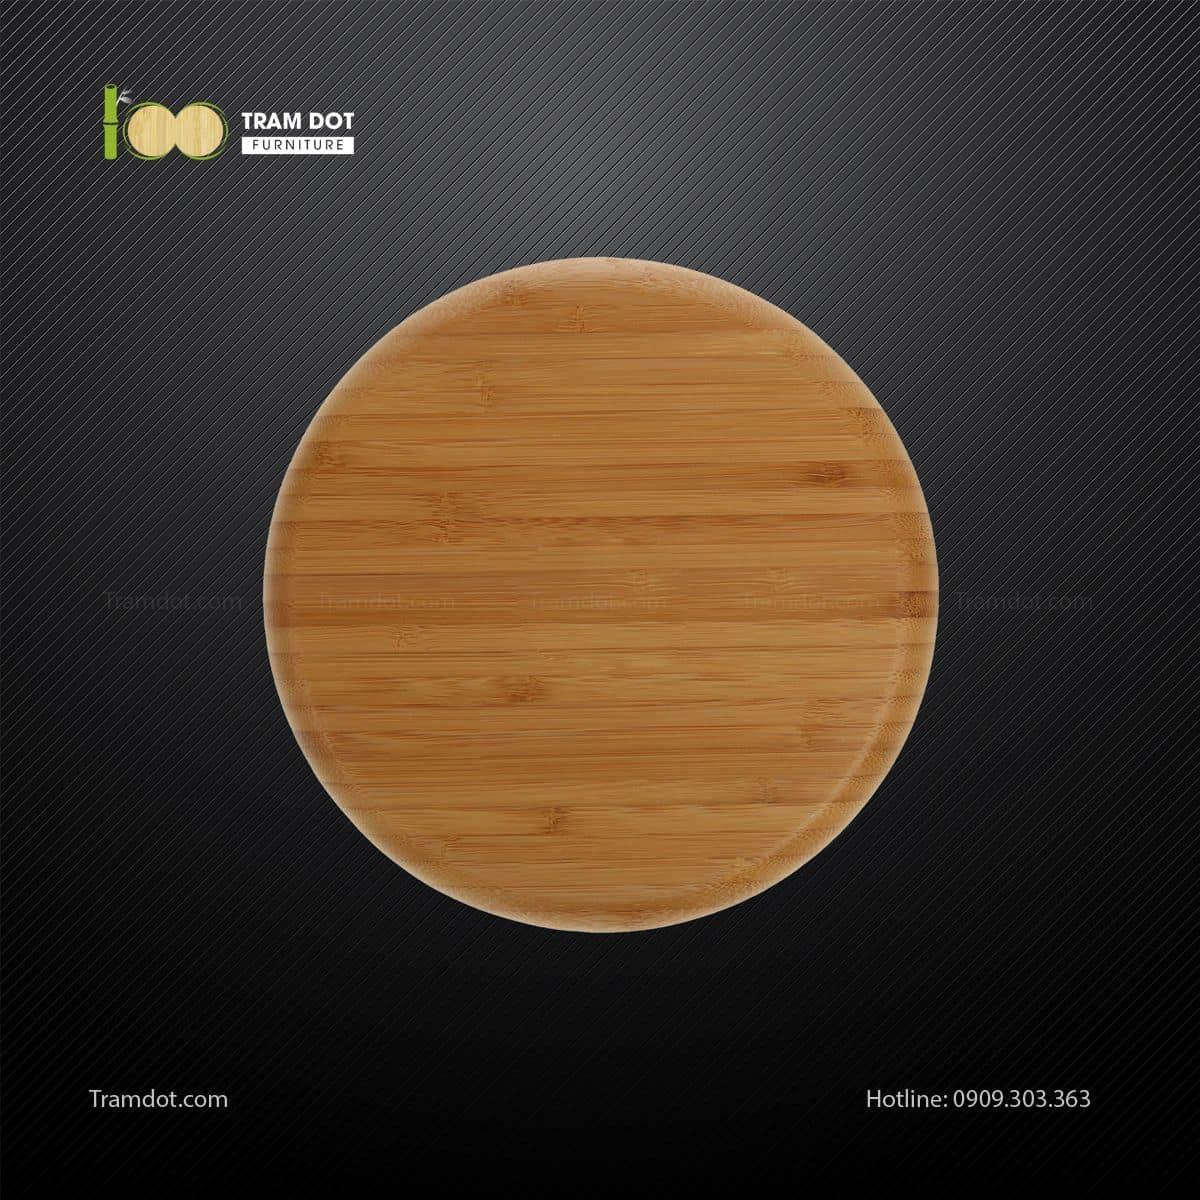 Đĩa tre tròn 20.5x20.5cm TRAMDOT